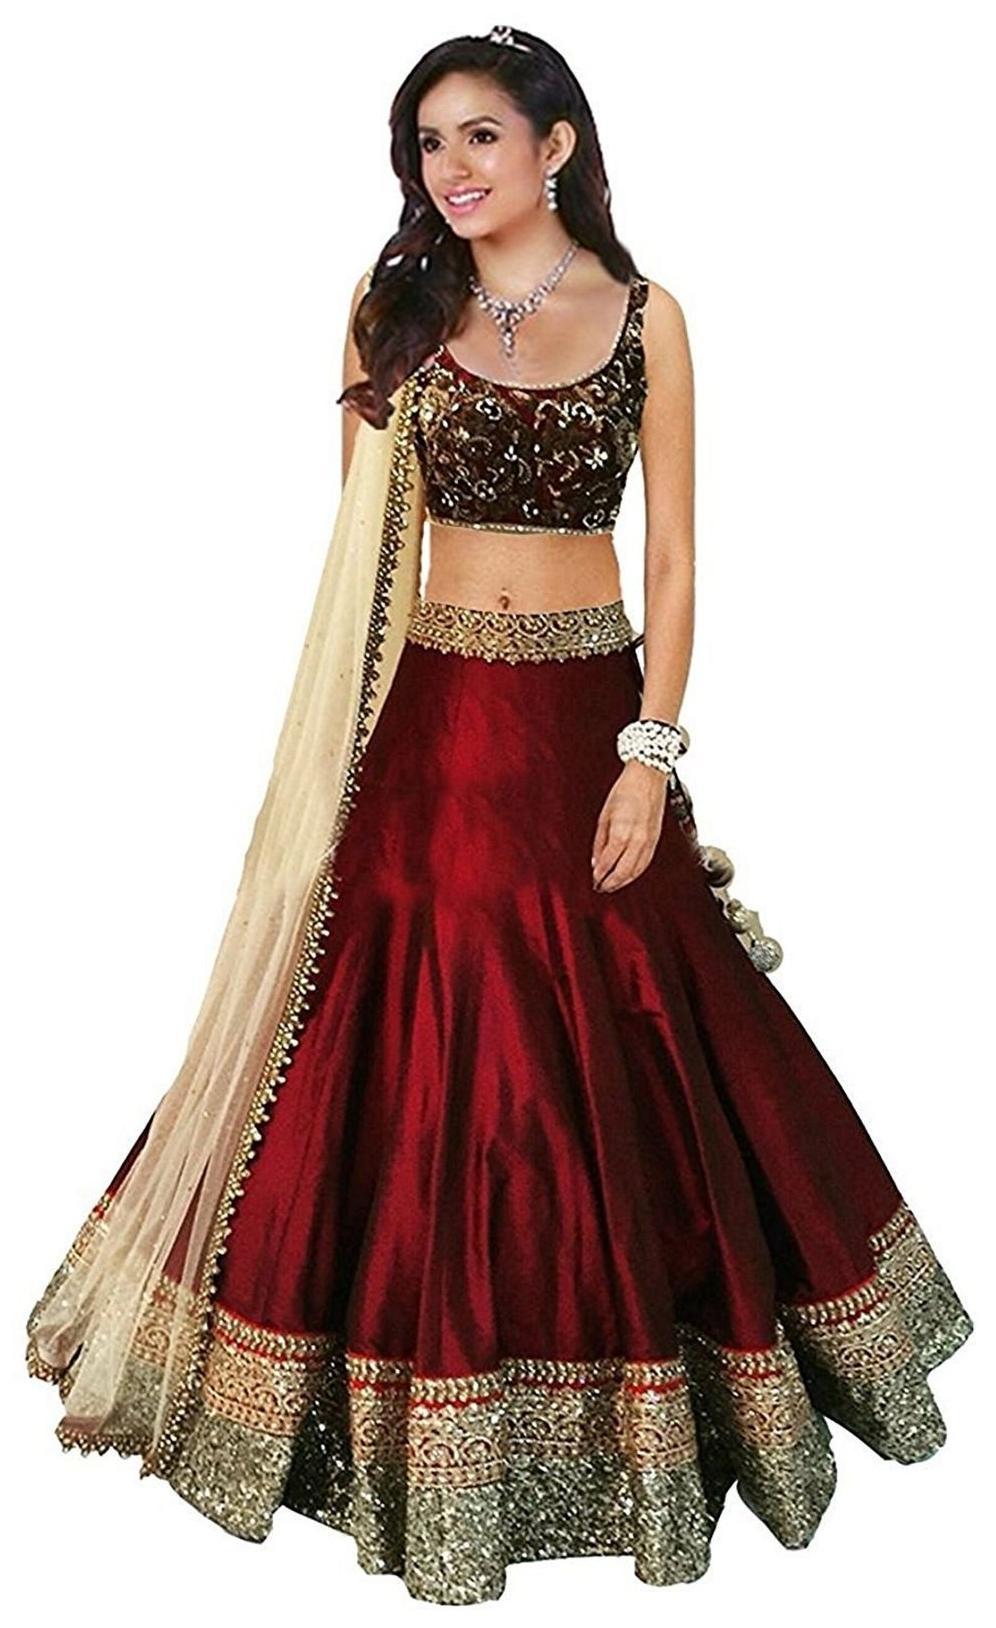 e81bffbb2ee08 https://assetscdn1.paytm.com/images/catalog/product/. Varibha Bollywood Designer  Lehenga Choli Maroon & YELLOW Party Wear Silk Lehenga ( best birthday ...